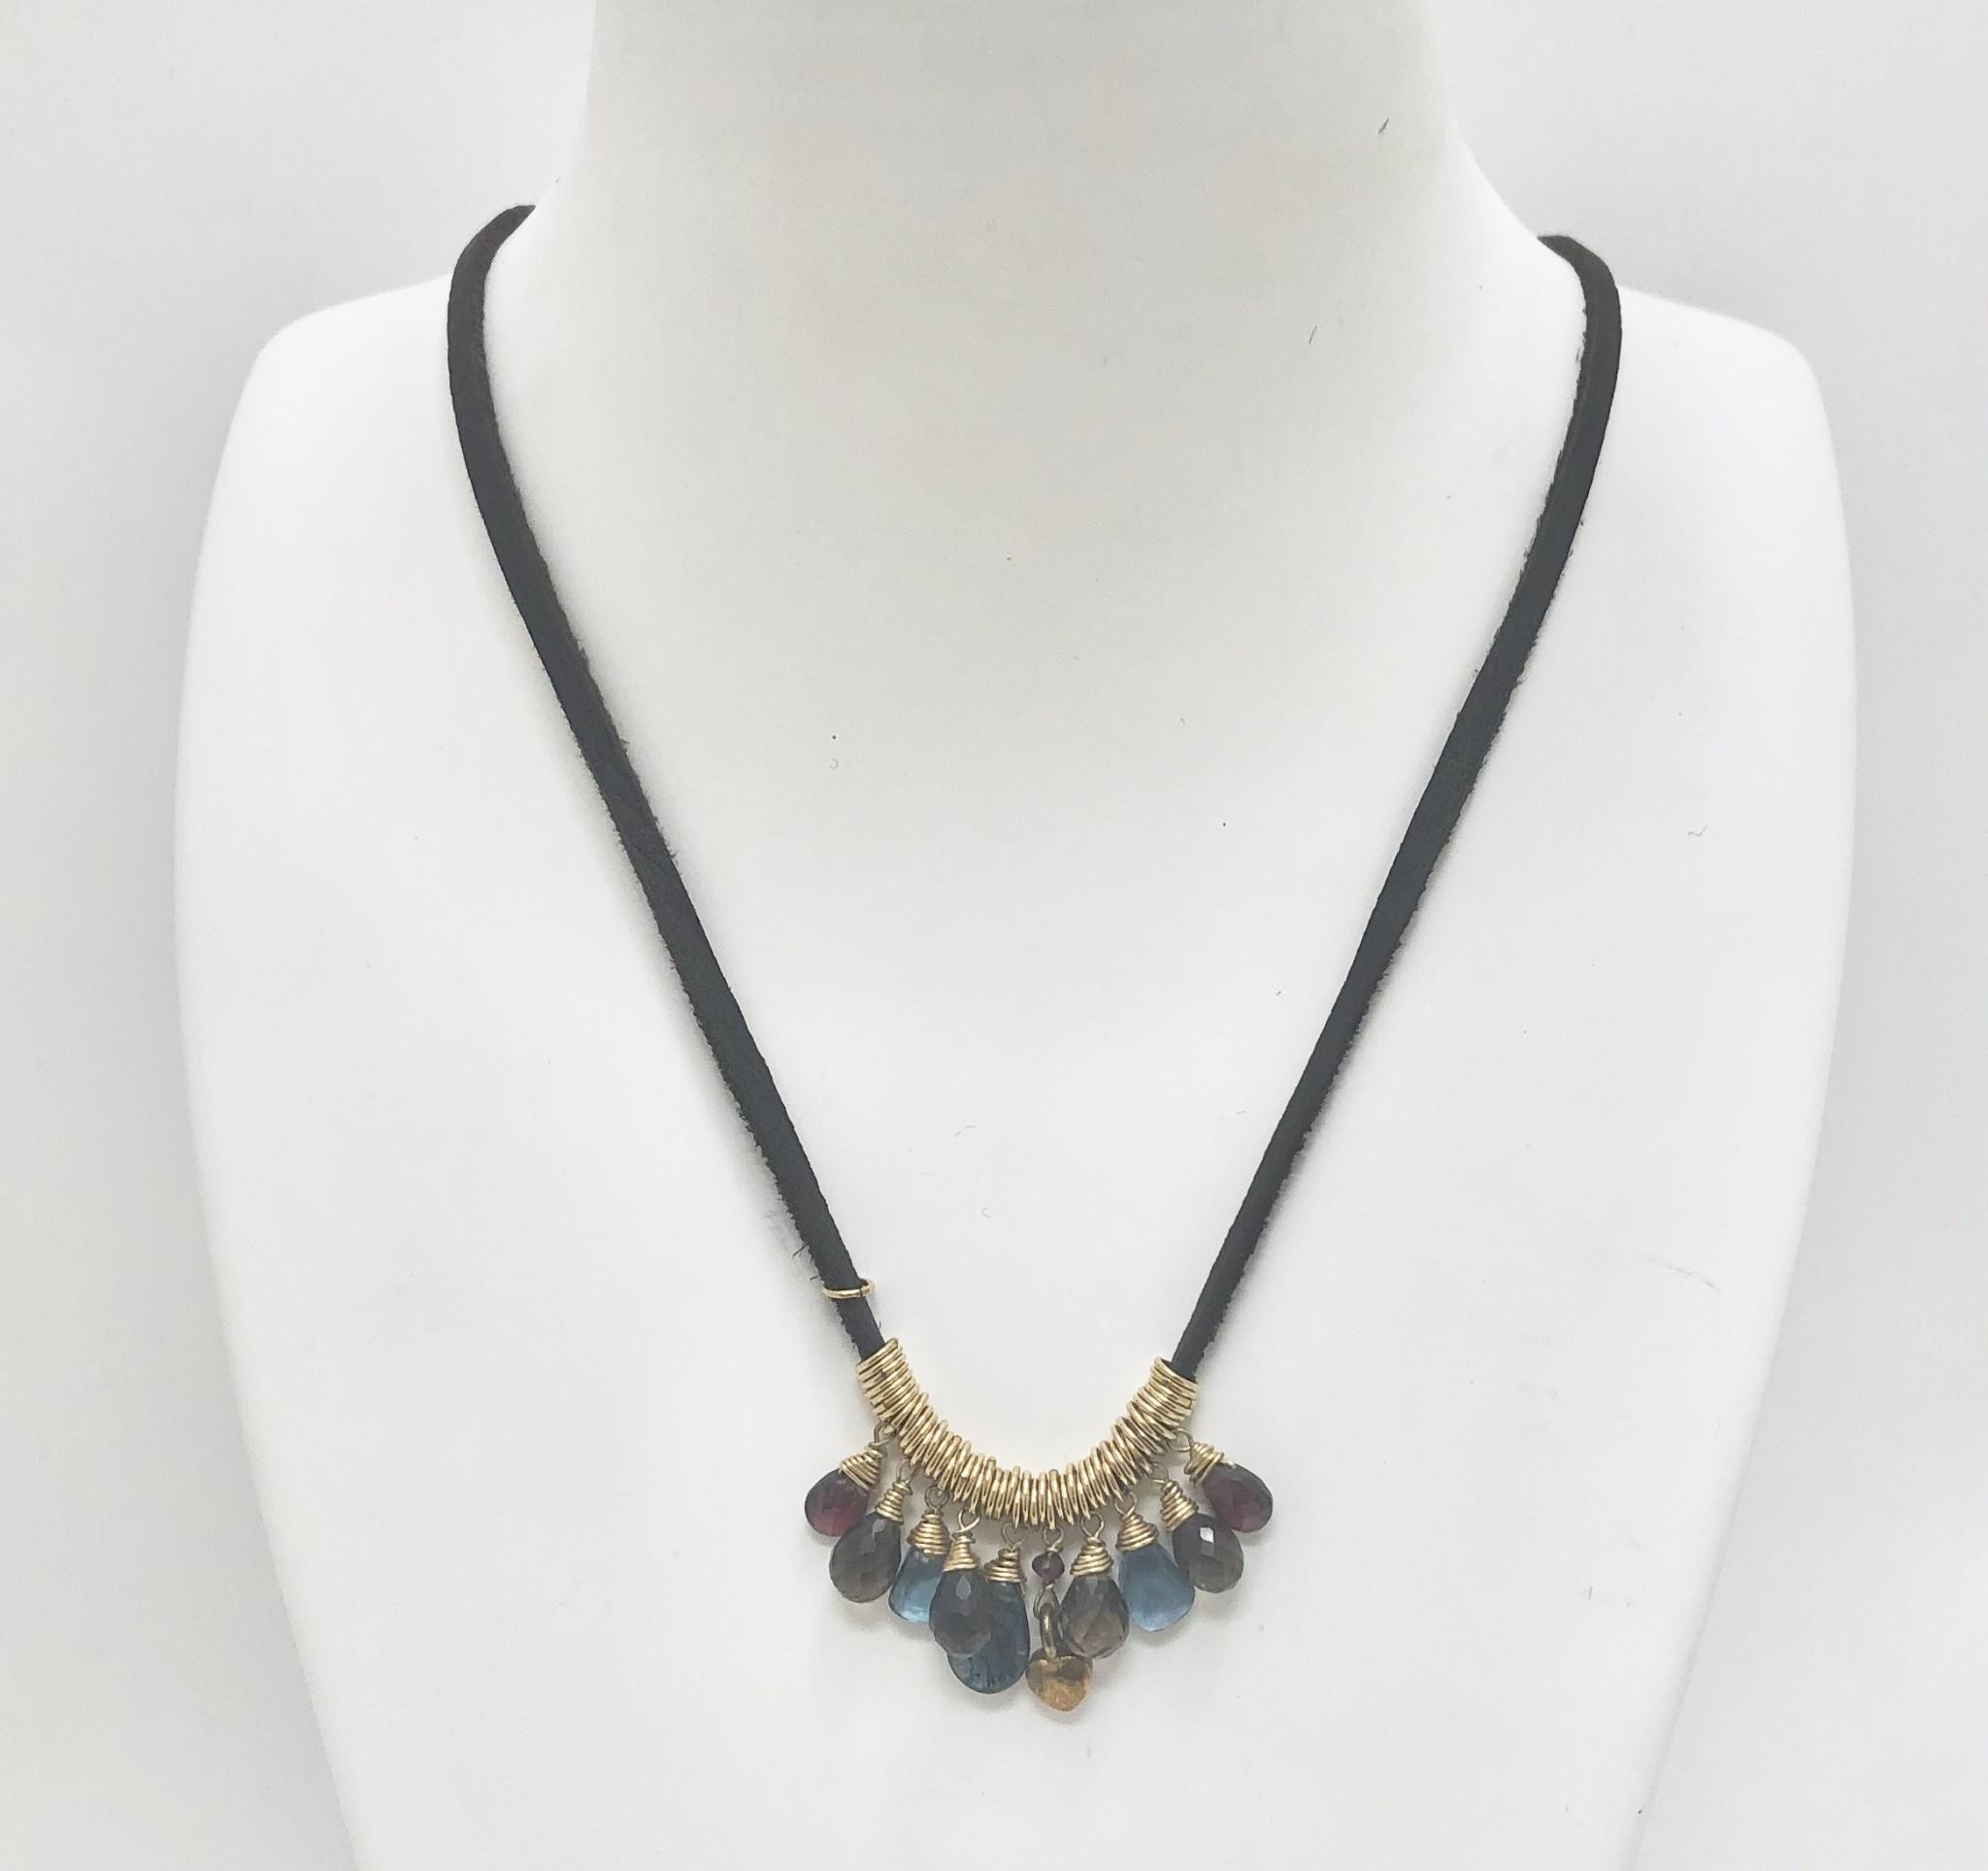 Droplets of Garnet, Smoky Quartz, London Blue Topaz and Kyanite Necklace